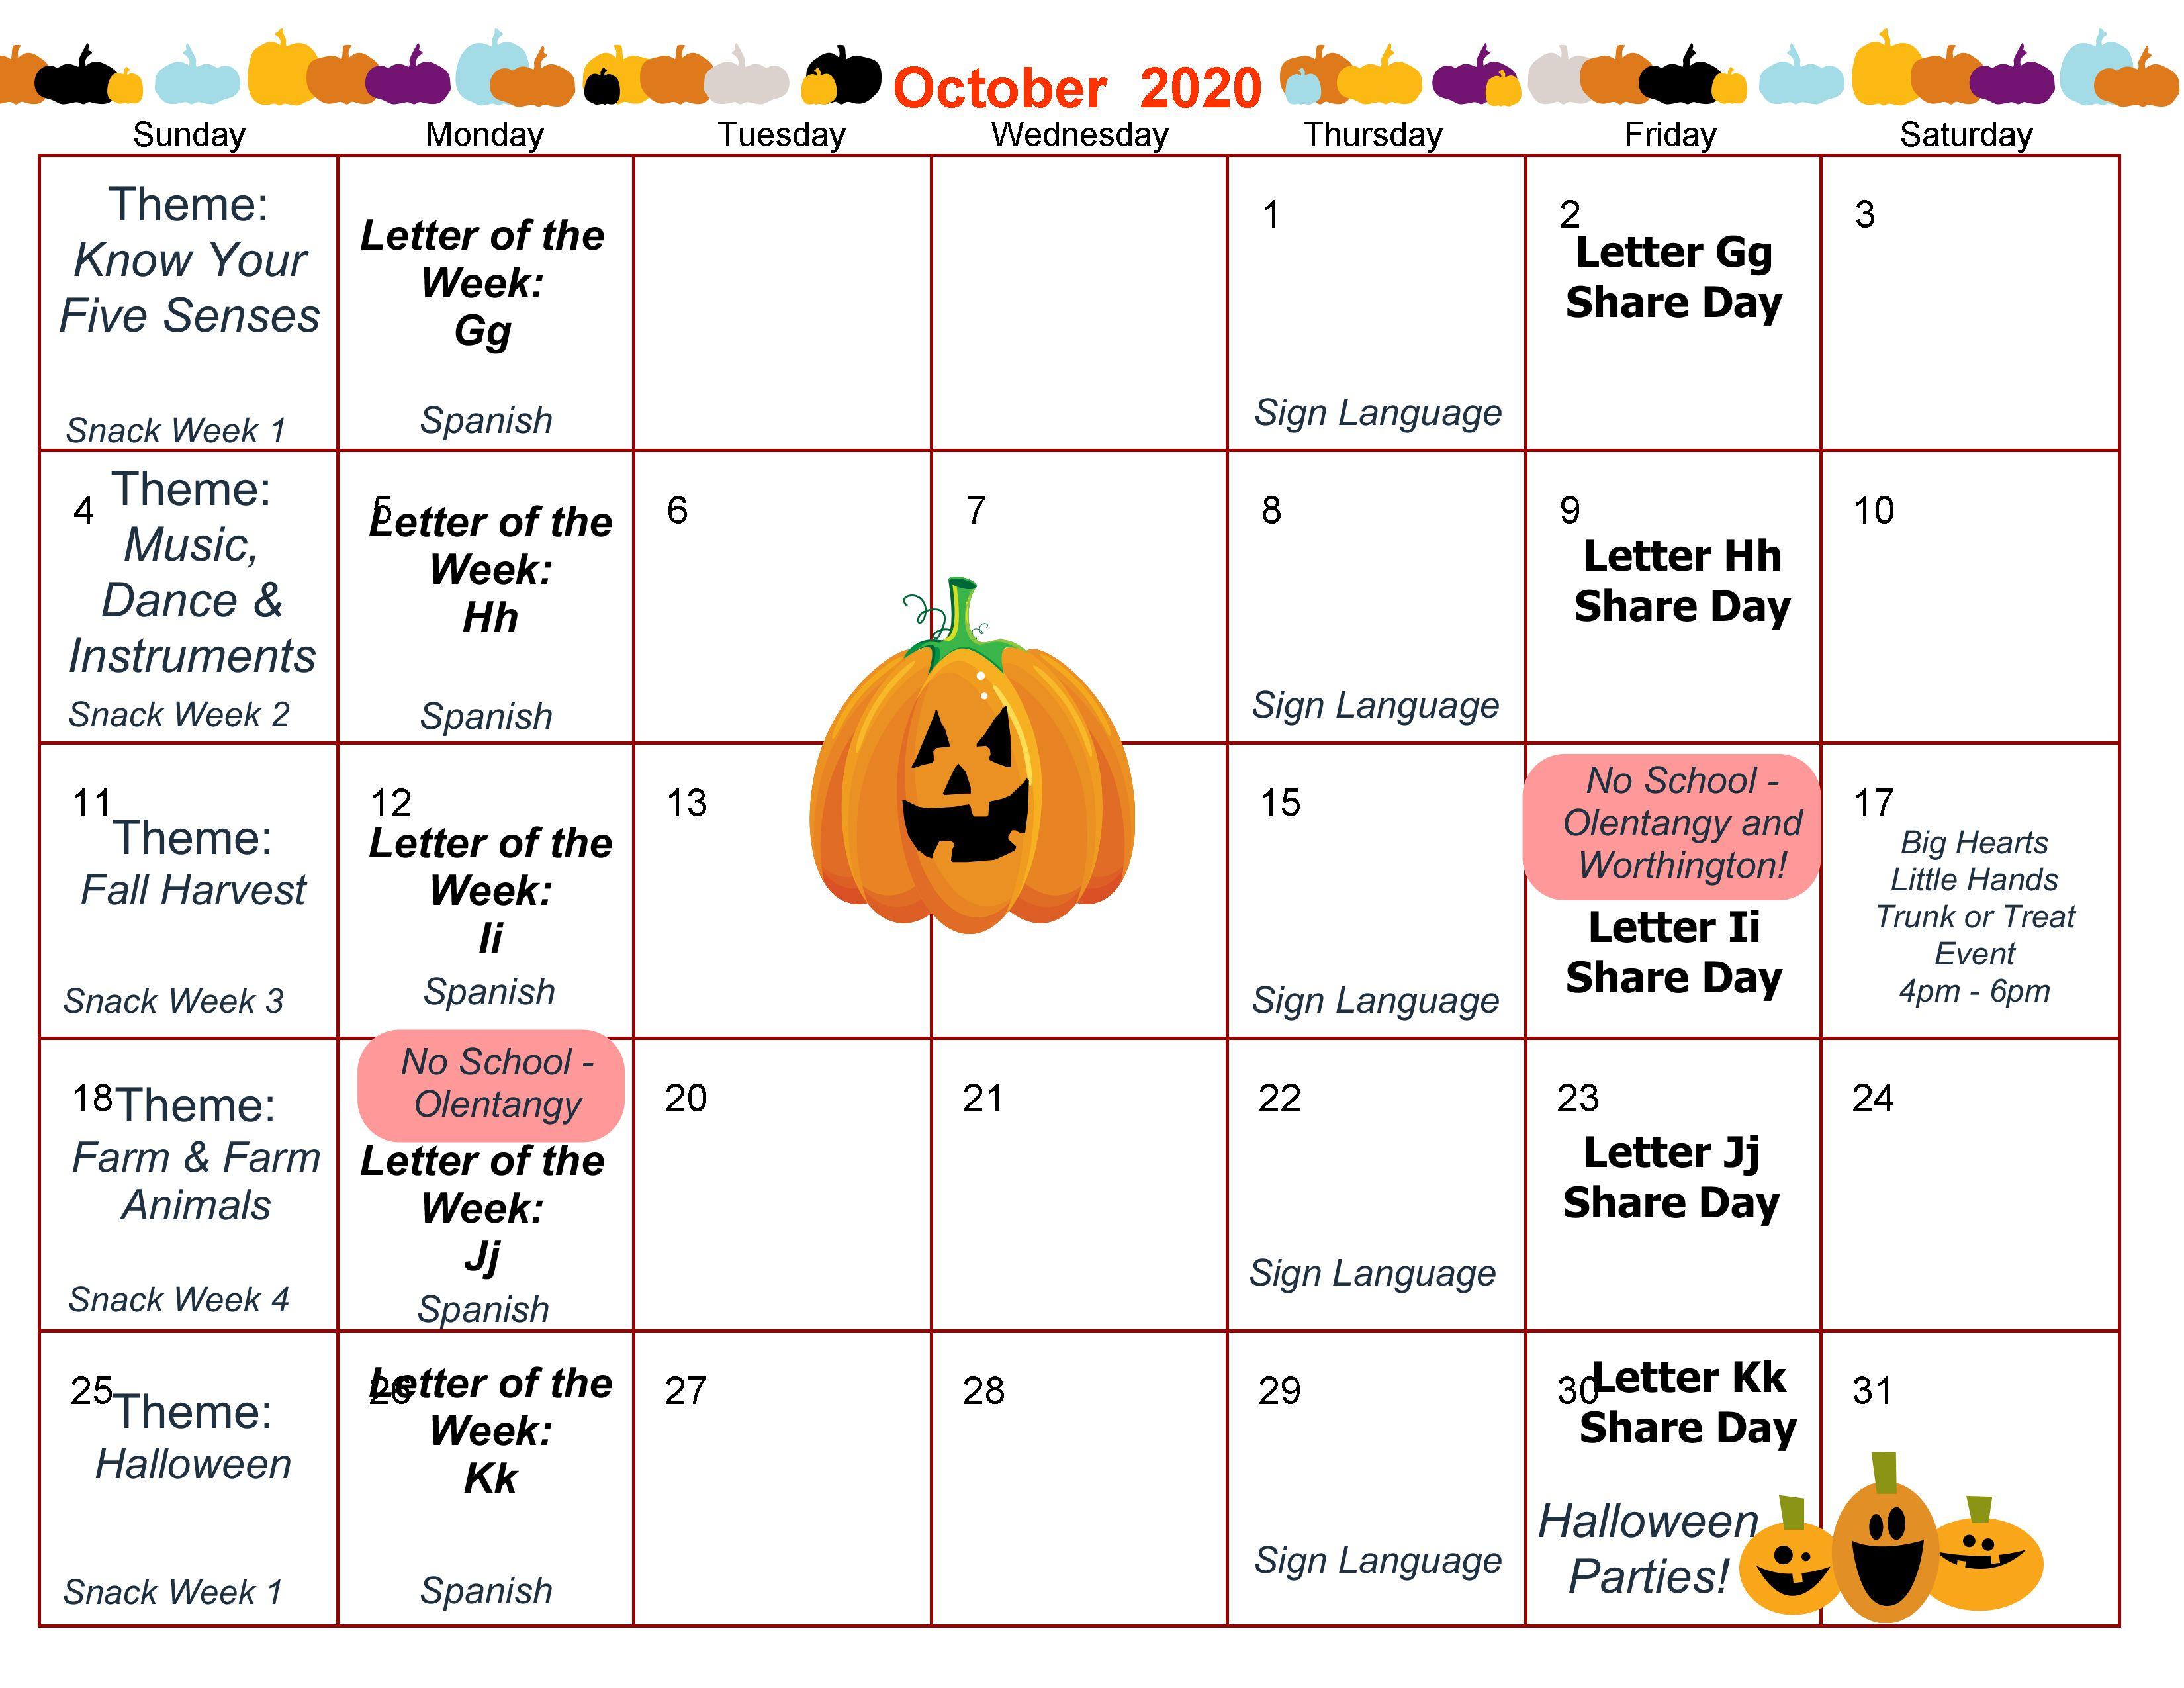 2020-10 BH October Calendar-001.jpg